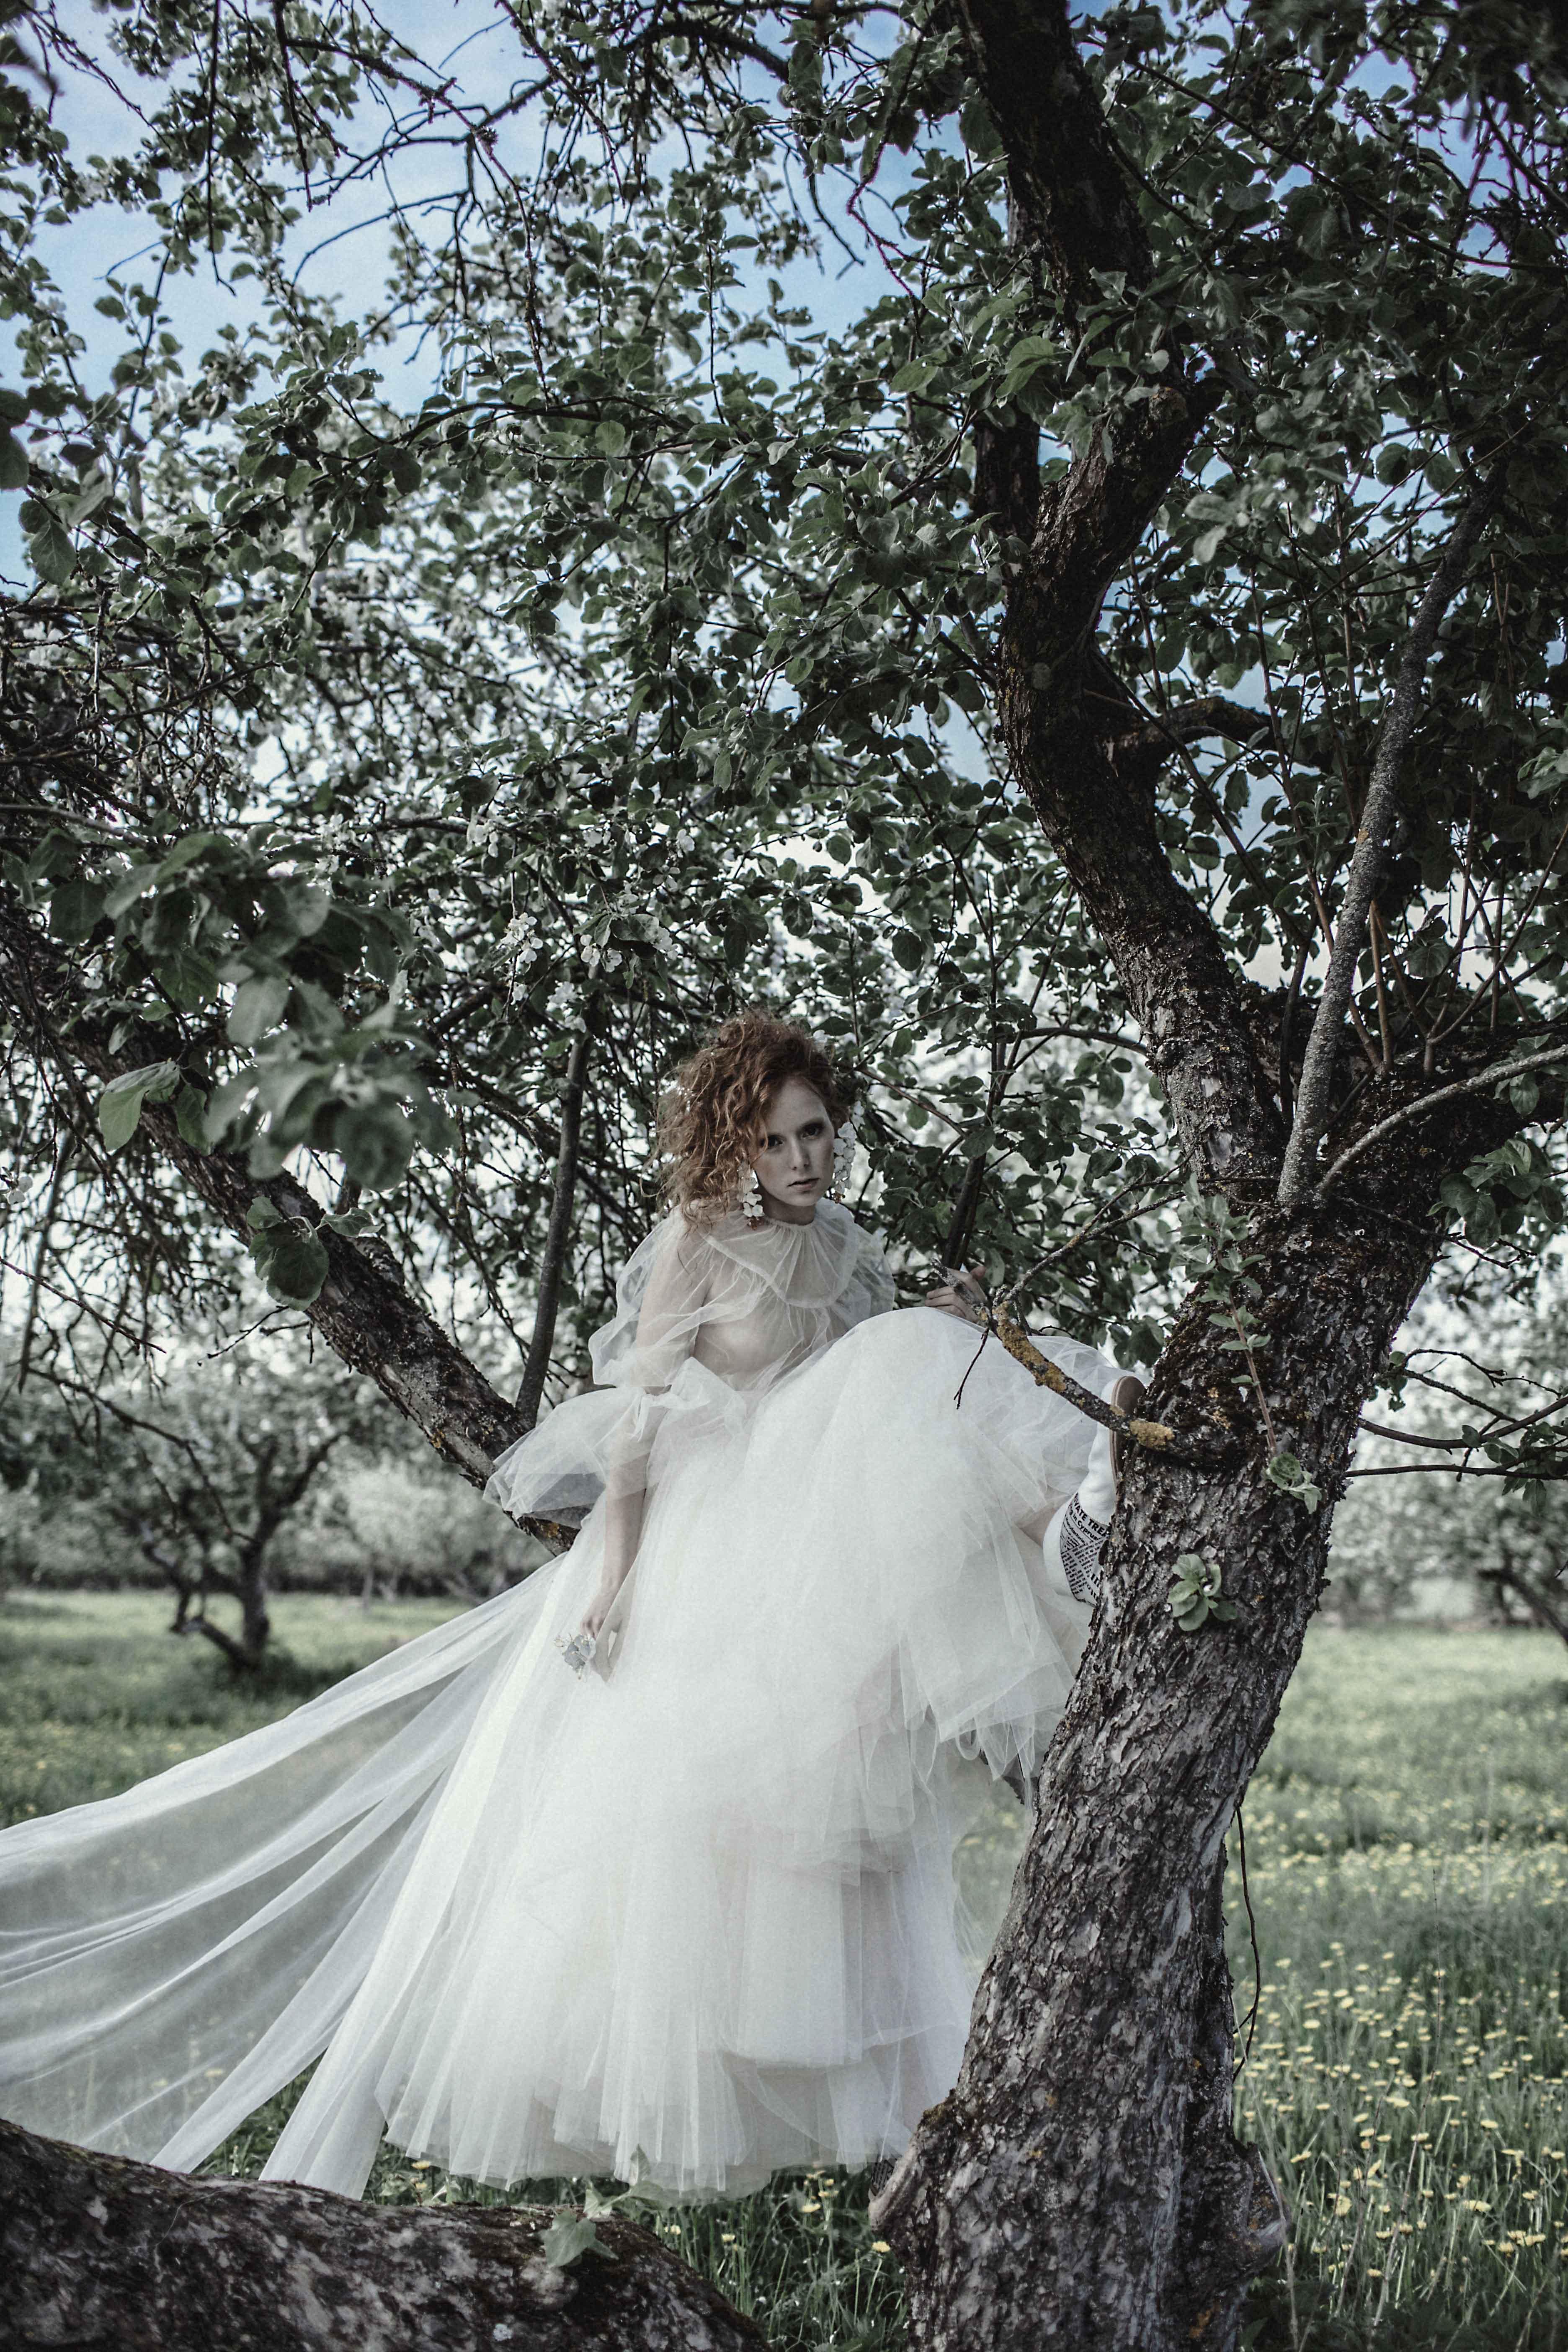 _Hanna Korsar_foto Stina Kase